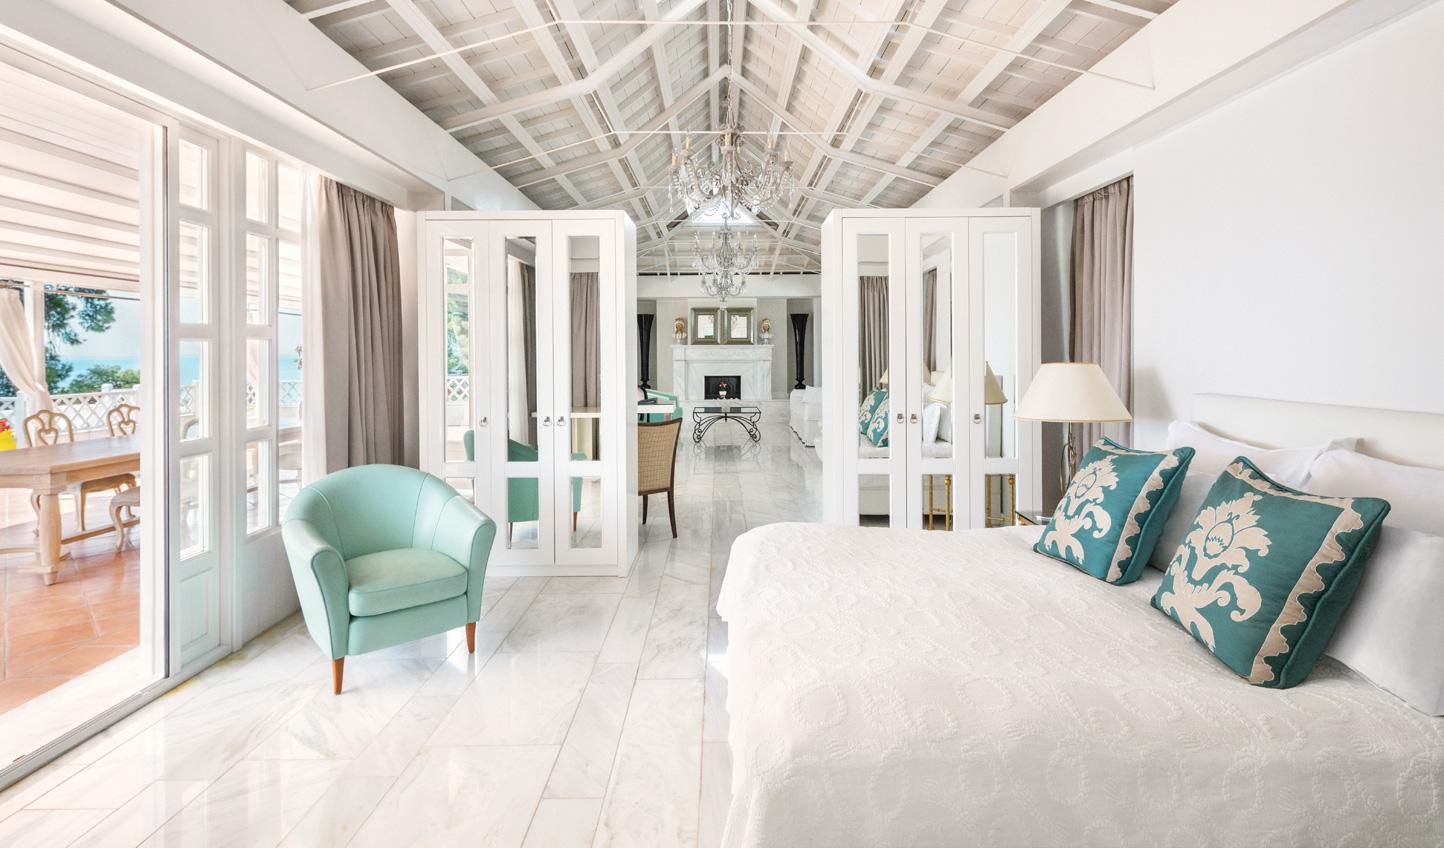 All white interiors are given a splash of Mediterranean blue